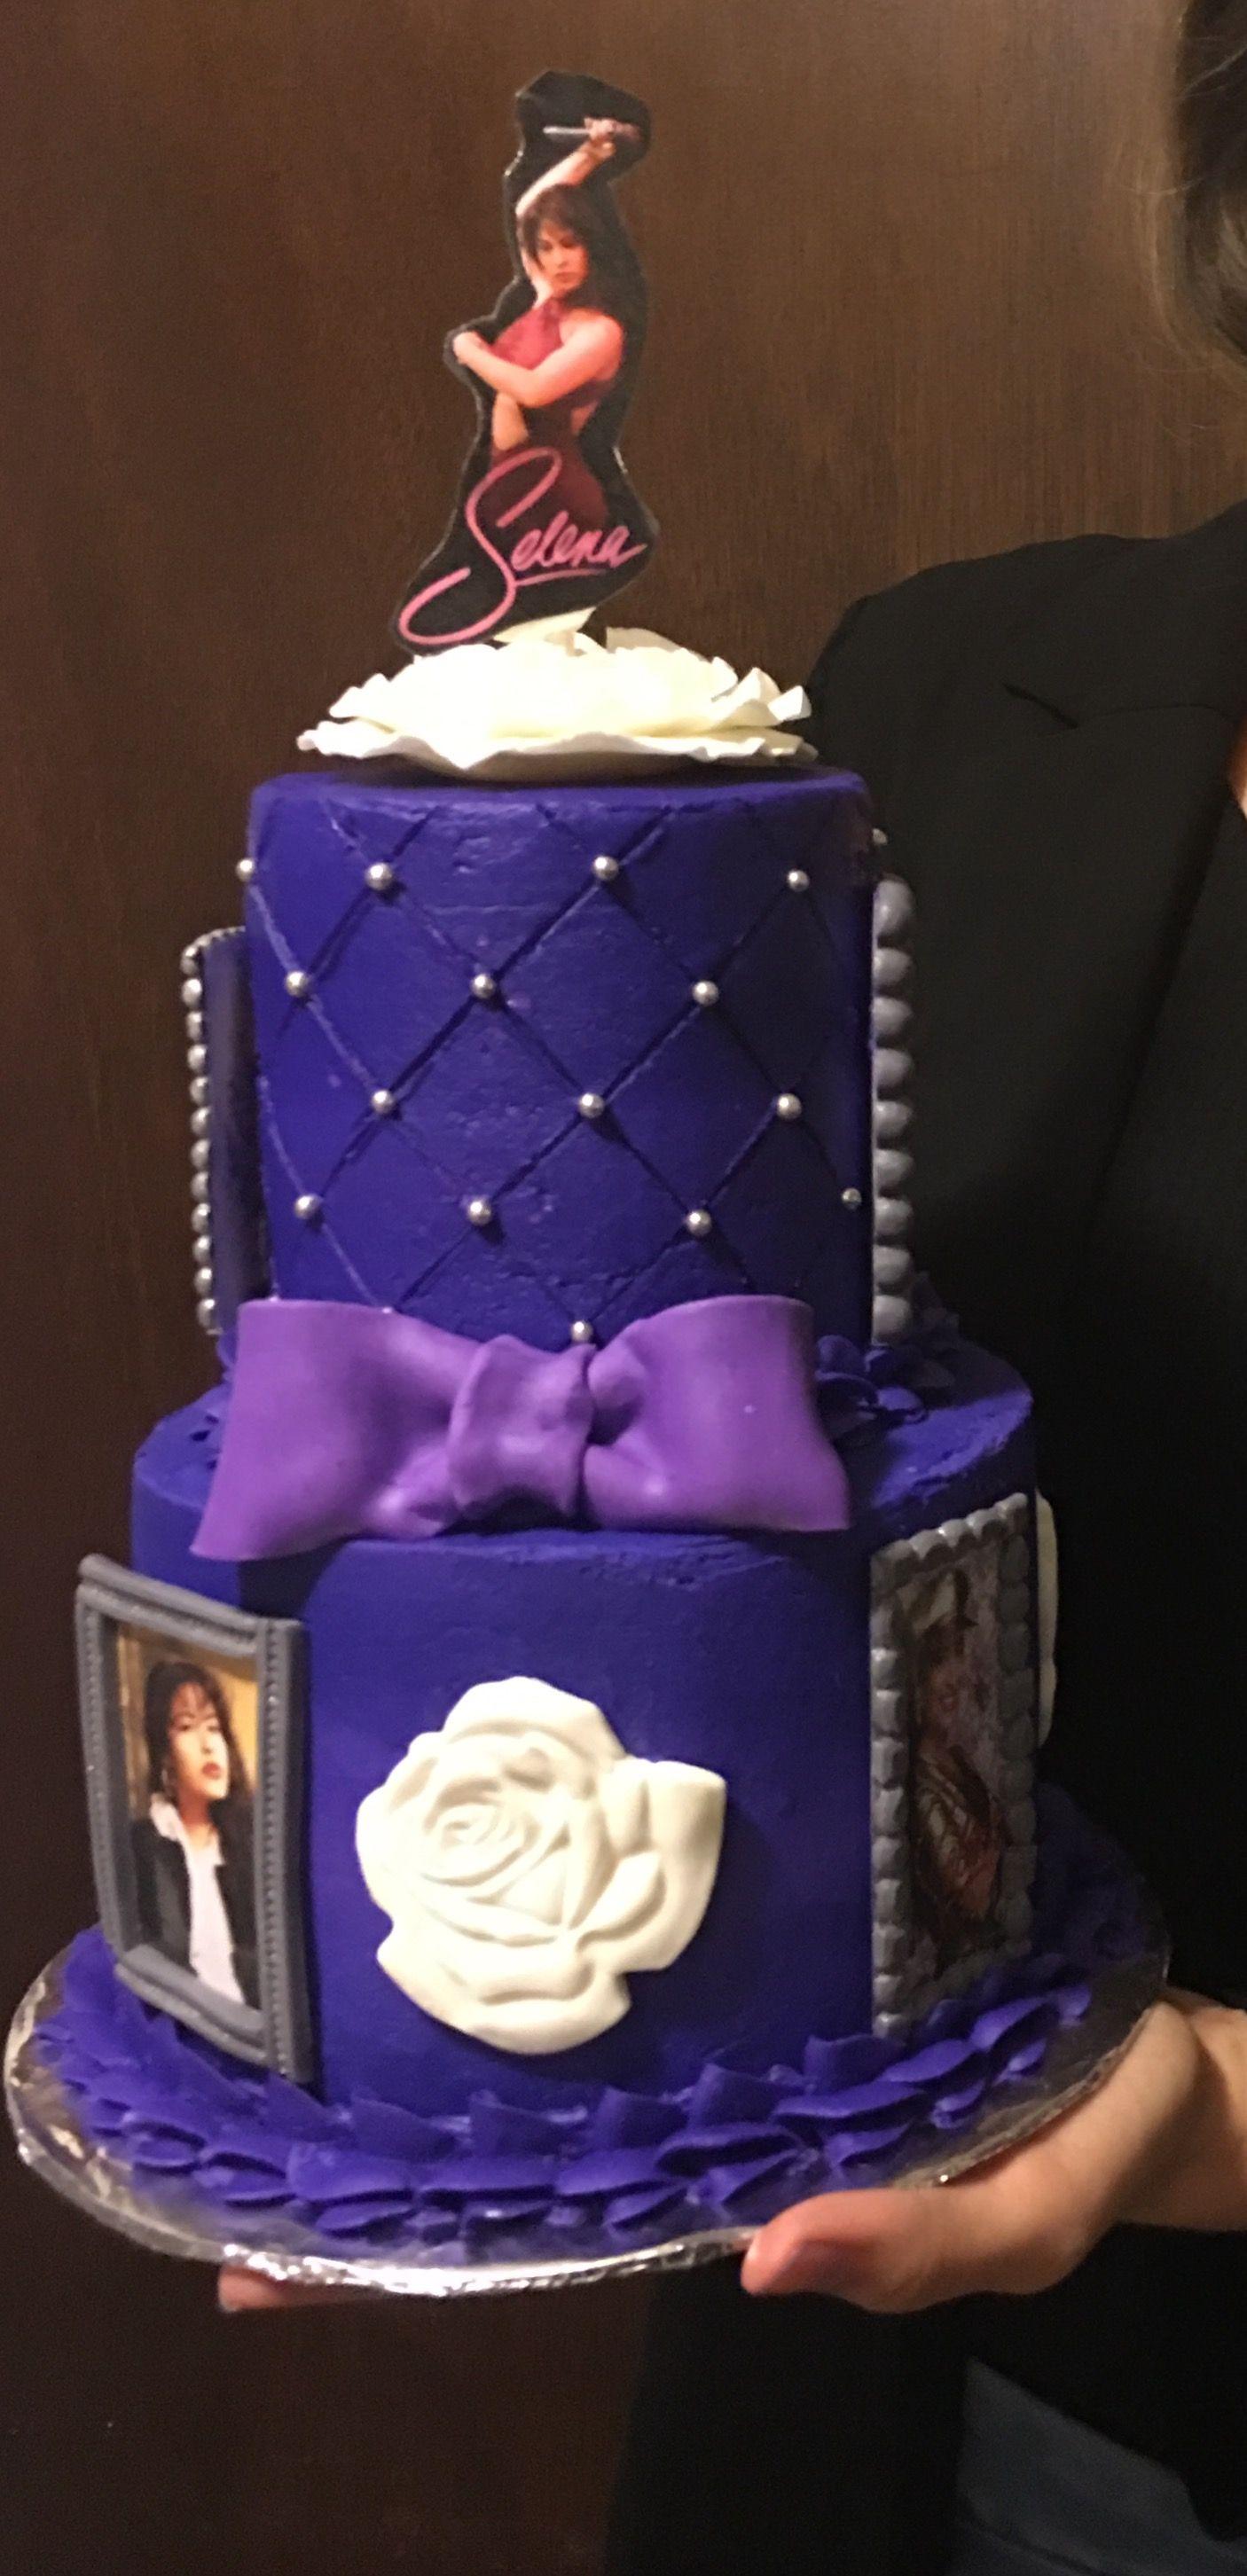 My Beautiful Selena College Graduation Cake! Selena